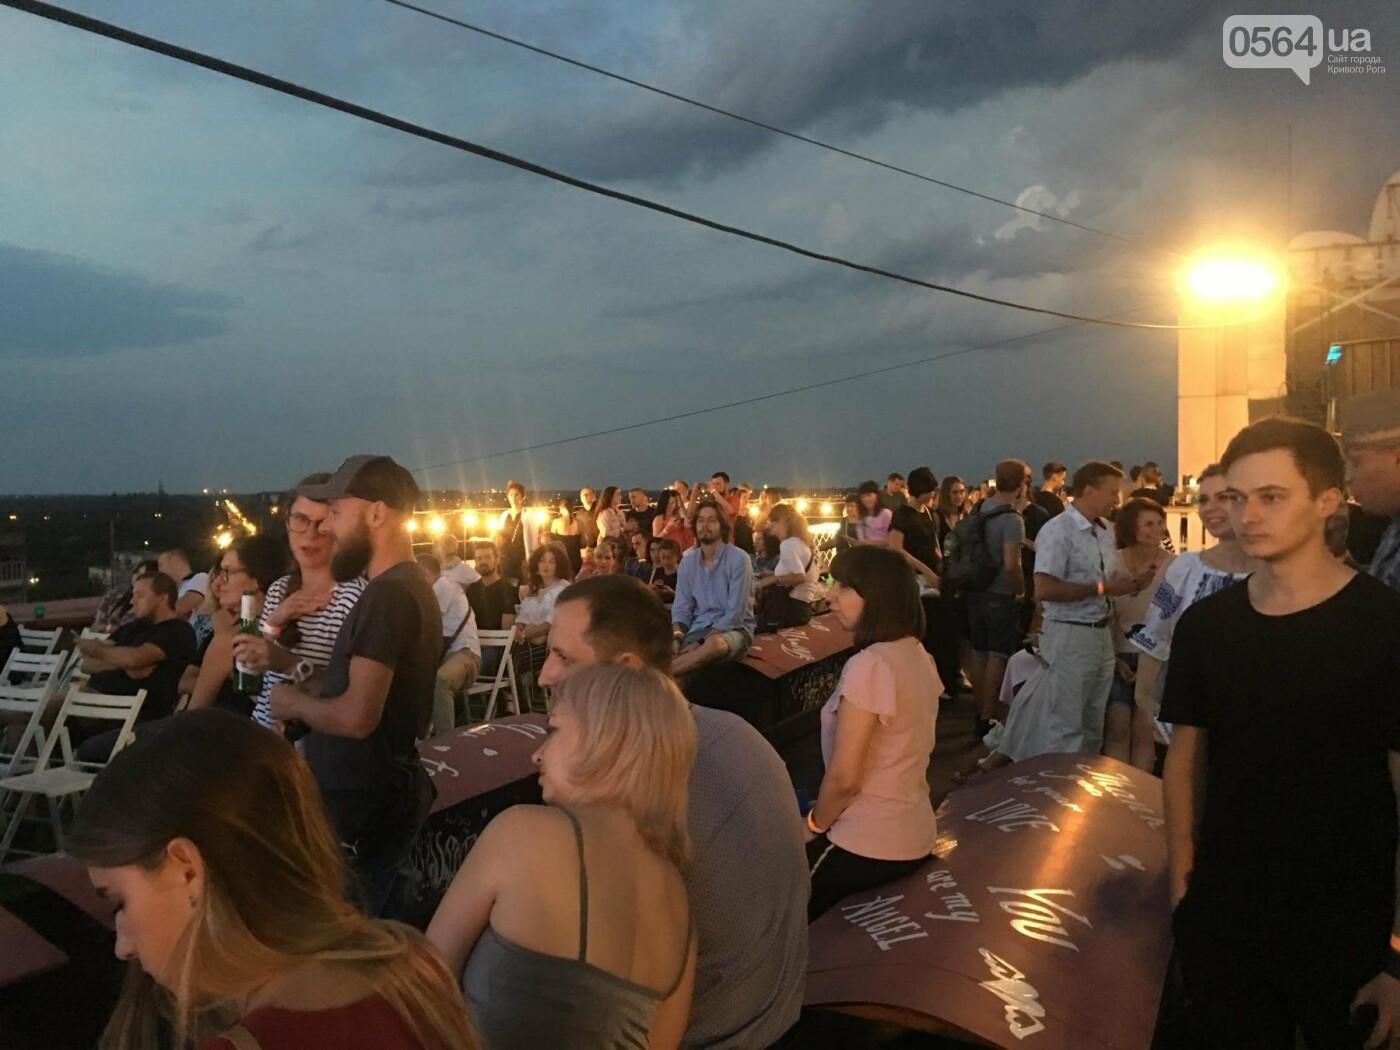 Сотни криворожан встречали закат на крыше отеля под мелодии джаза, - ФОТО, ВИДЕО, фото-38